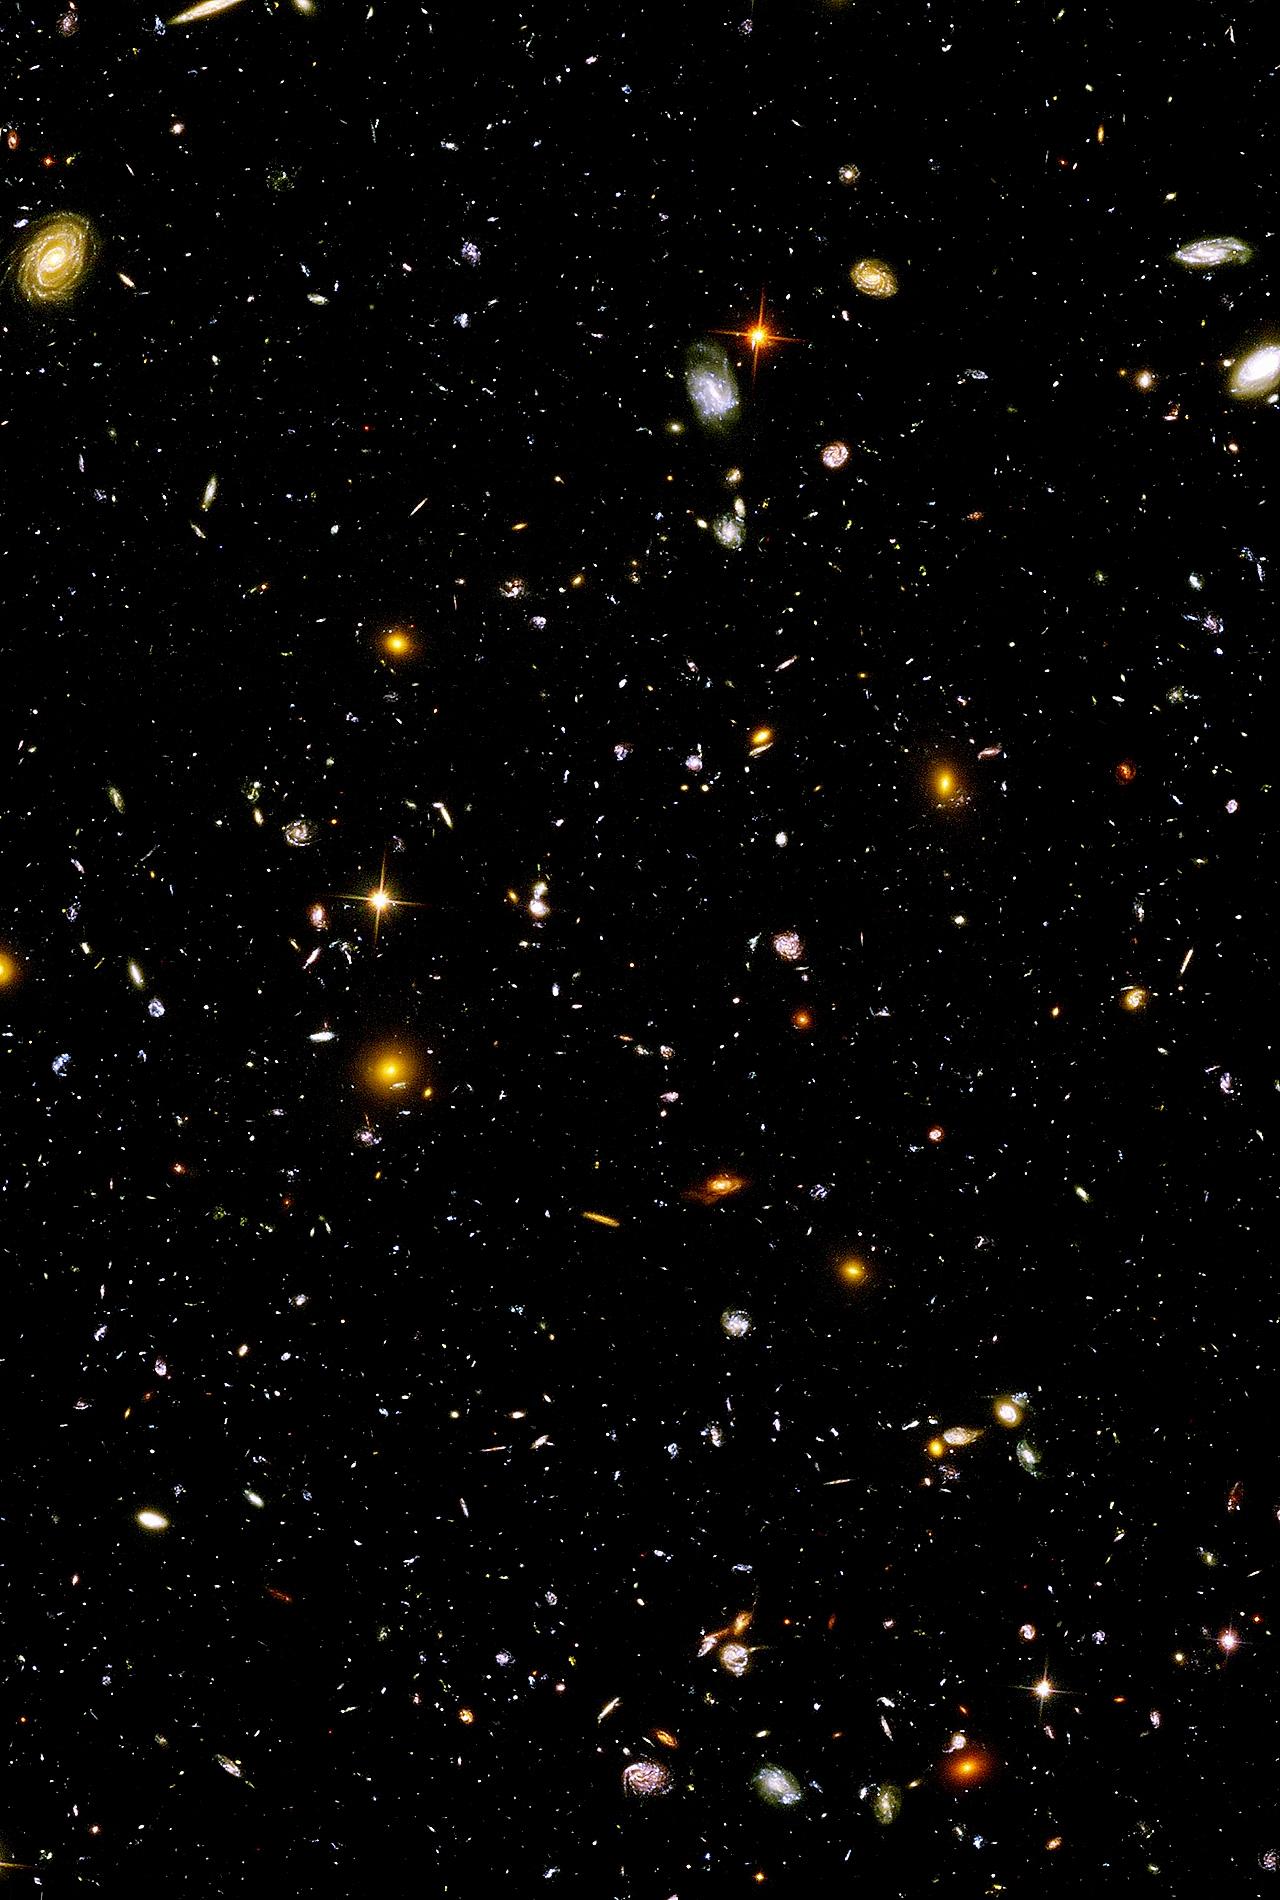 [49+] Hubble Deep Space Wallpaper on WallpaperSafari